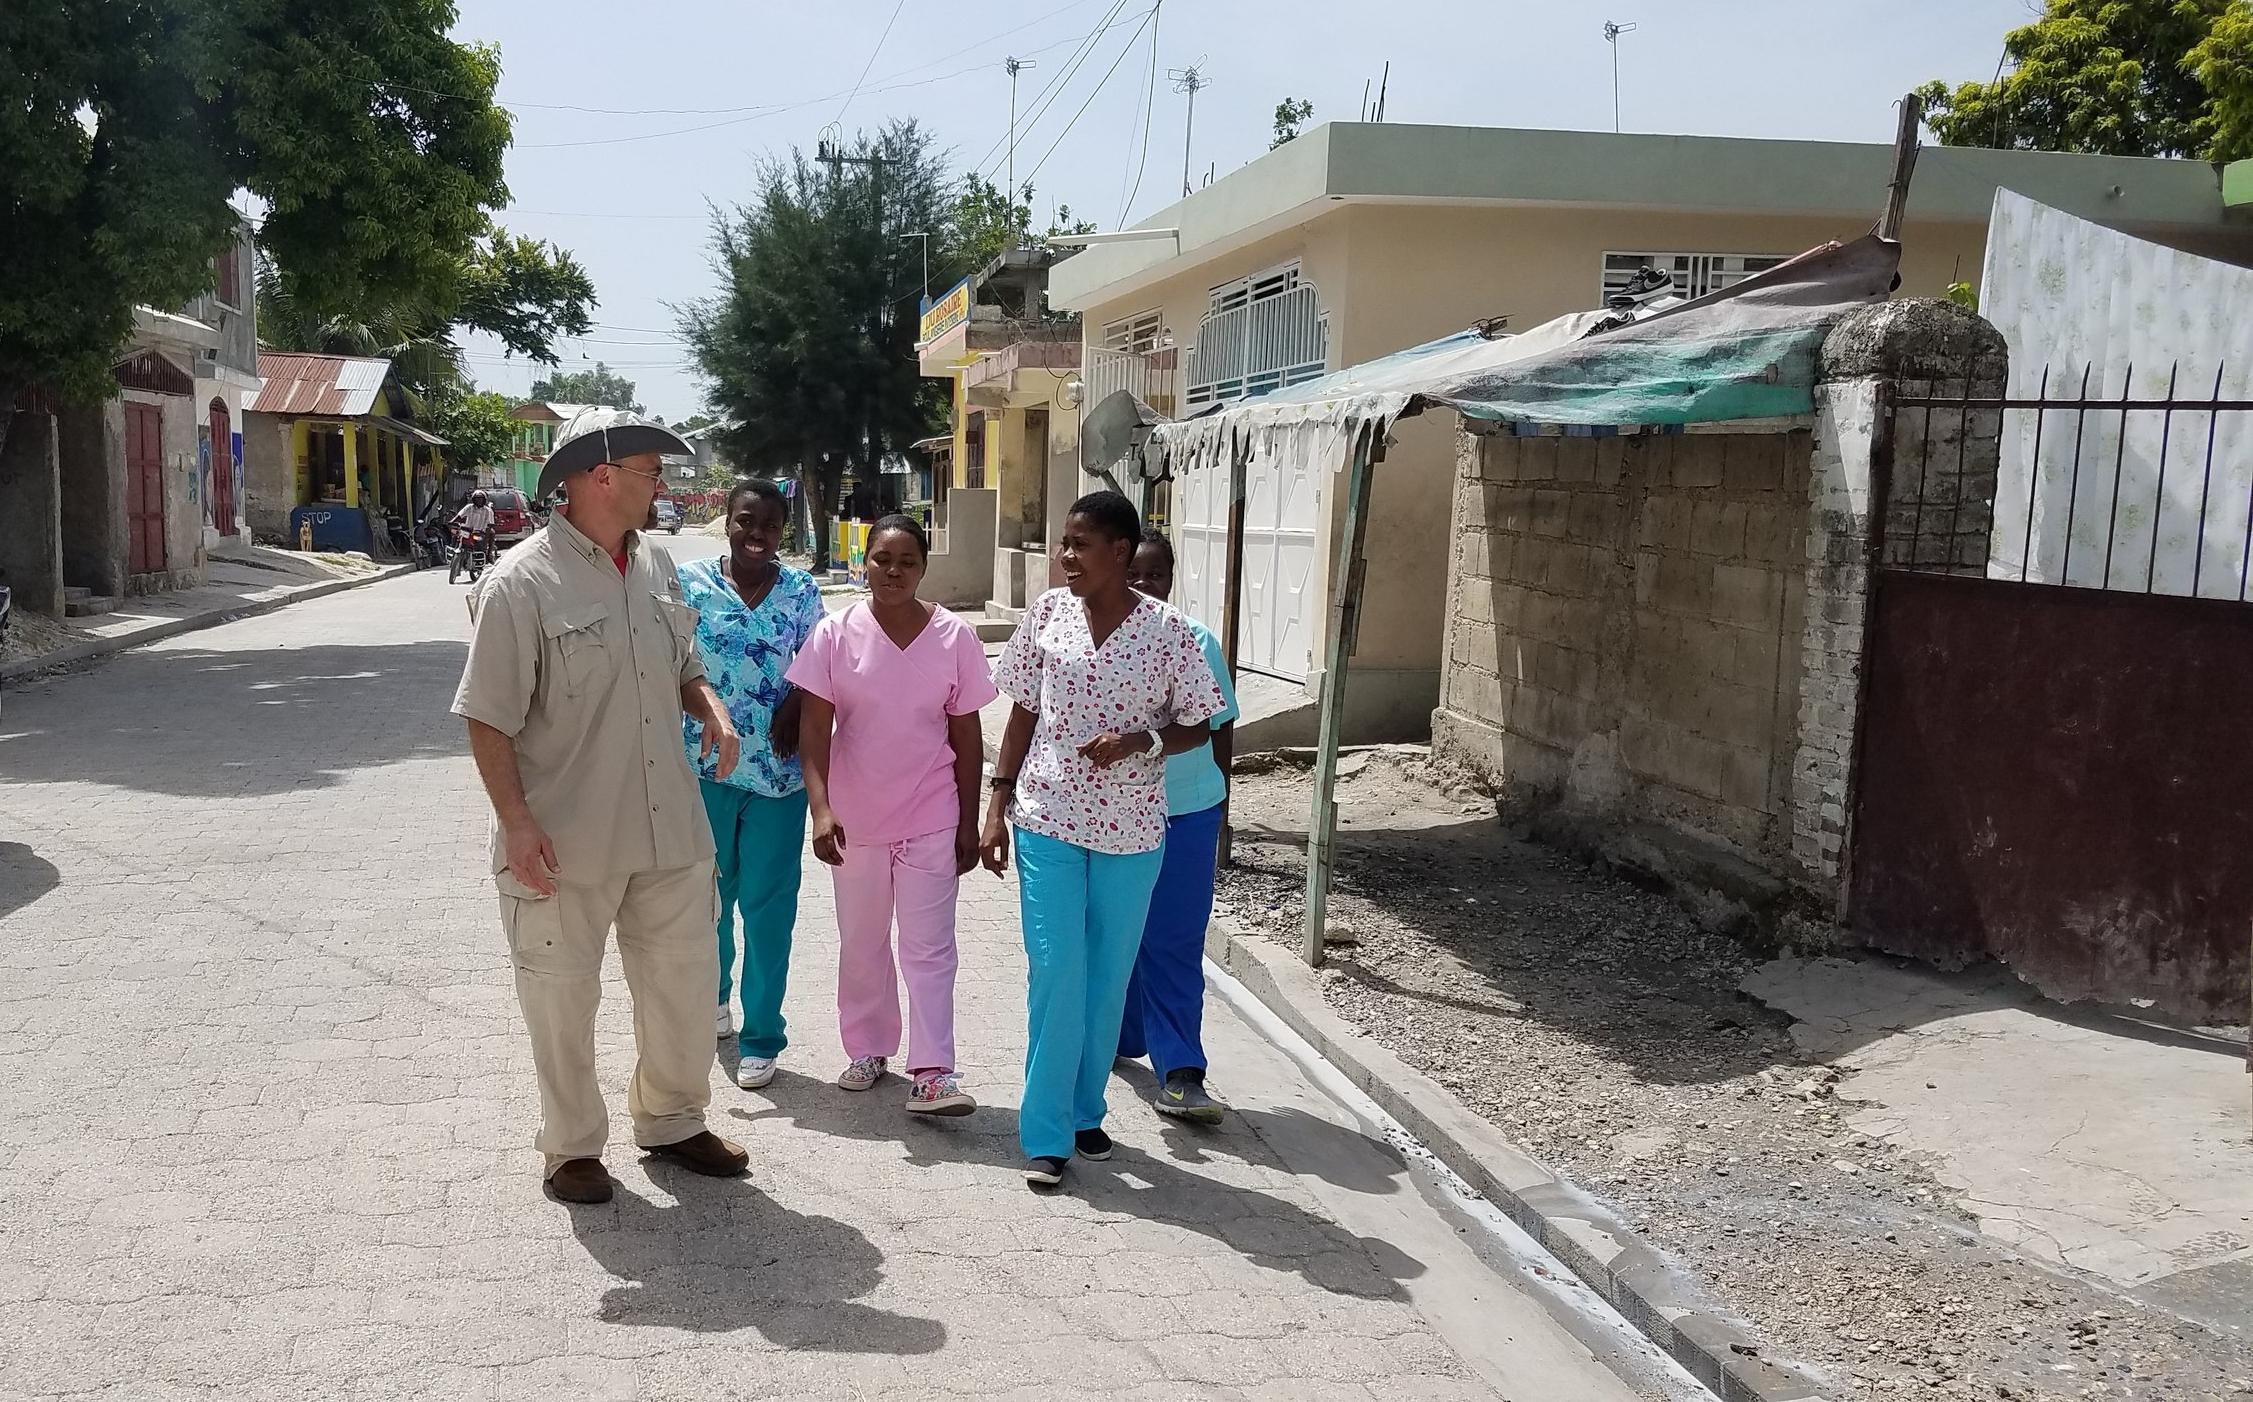 Nurses taking a walk through town